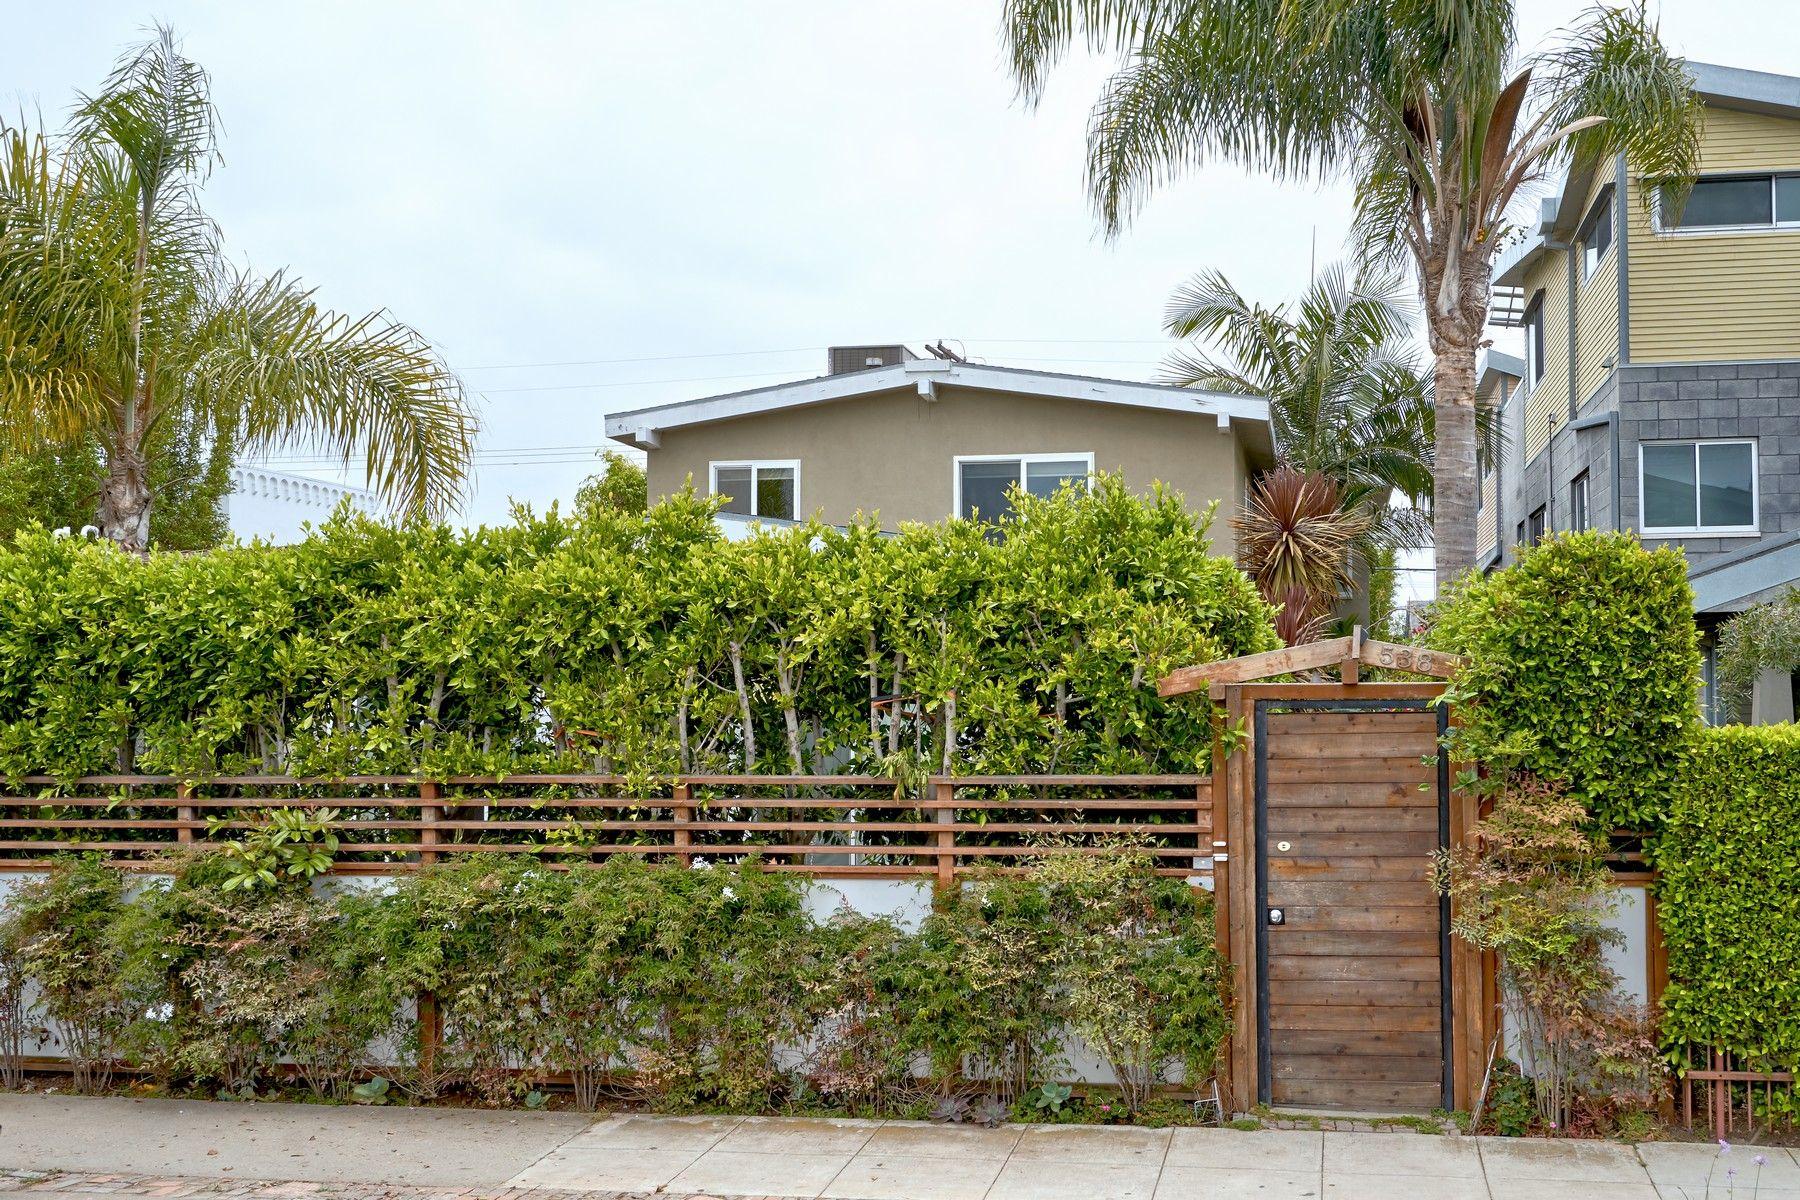 Apartments for Sale at Venice-Silicon Beach Gated Four-Plex 538 Brooks Avenue Venice, California 90291 United States